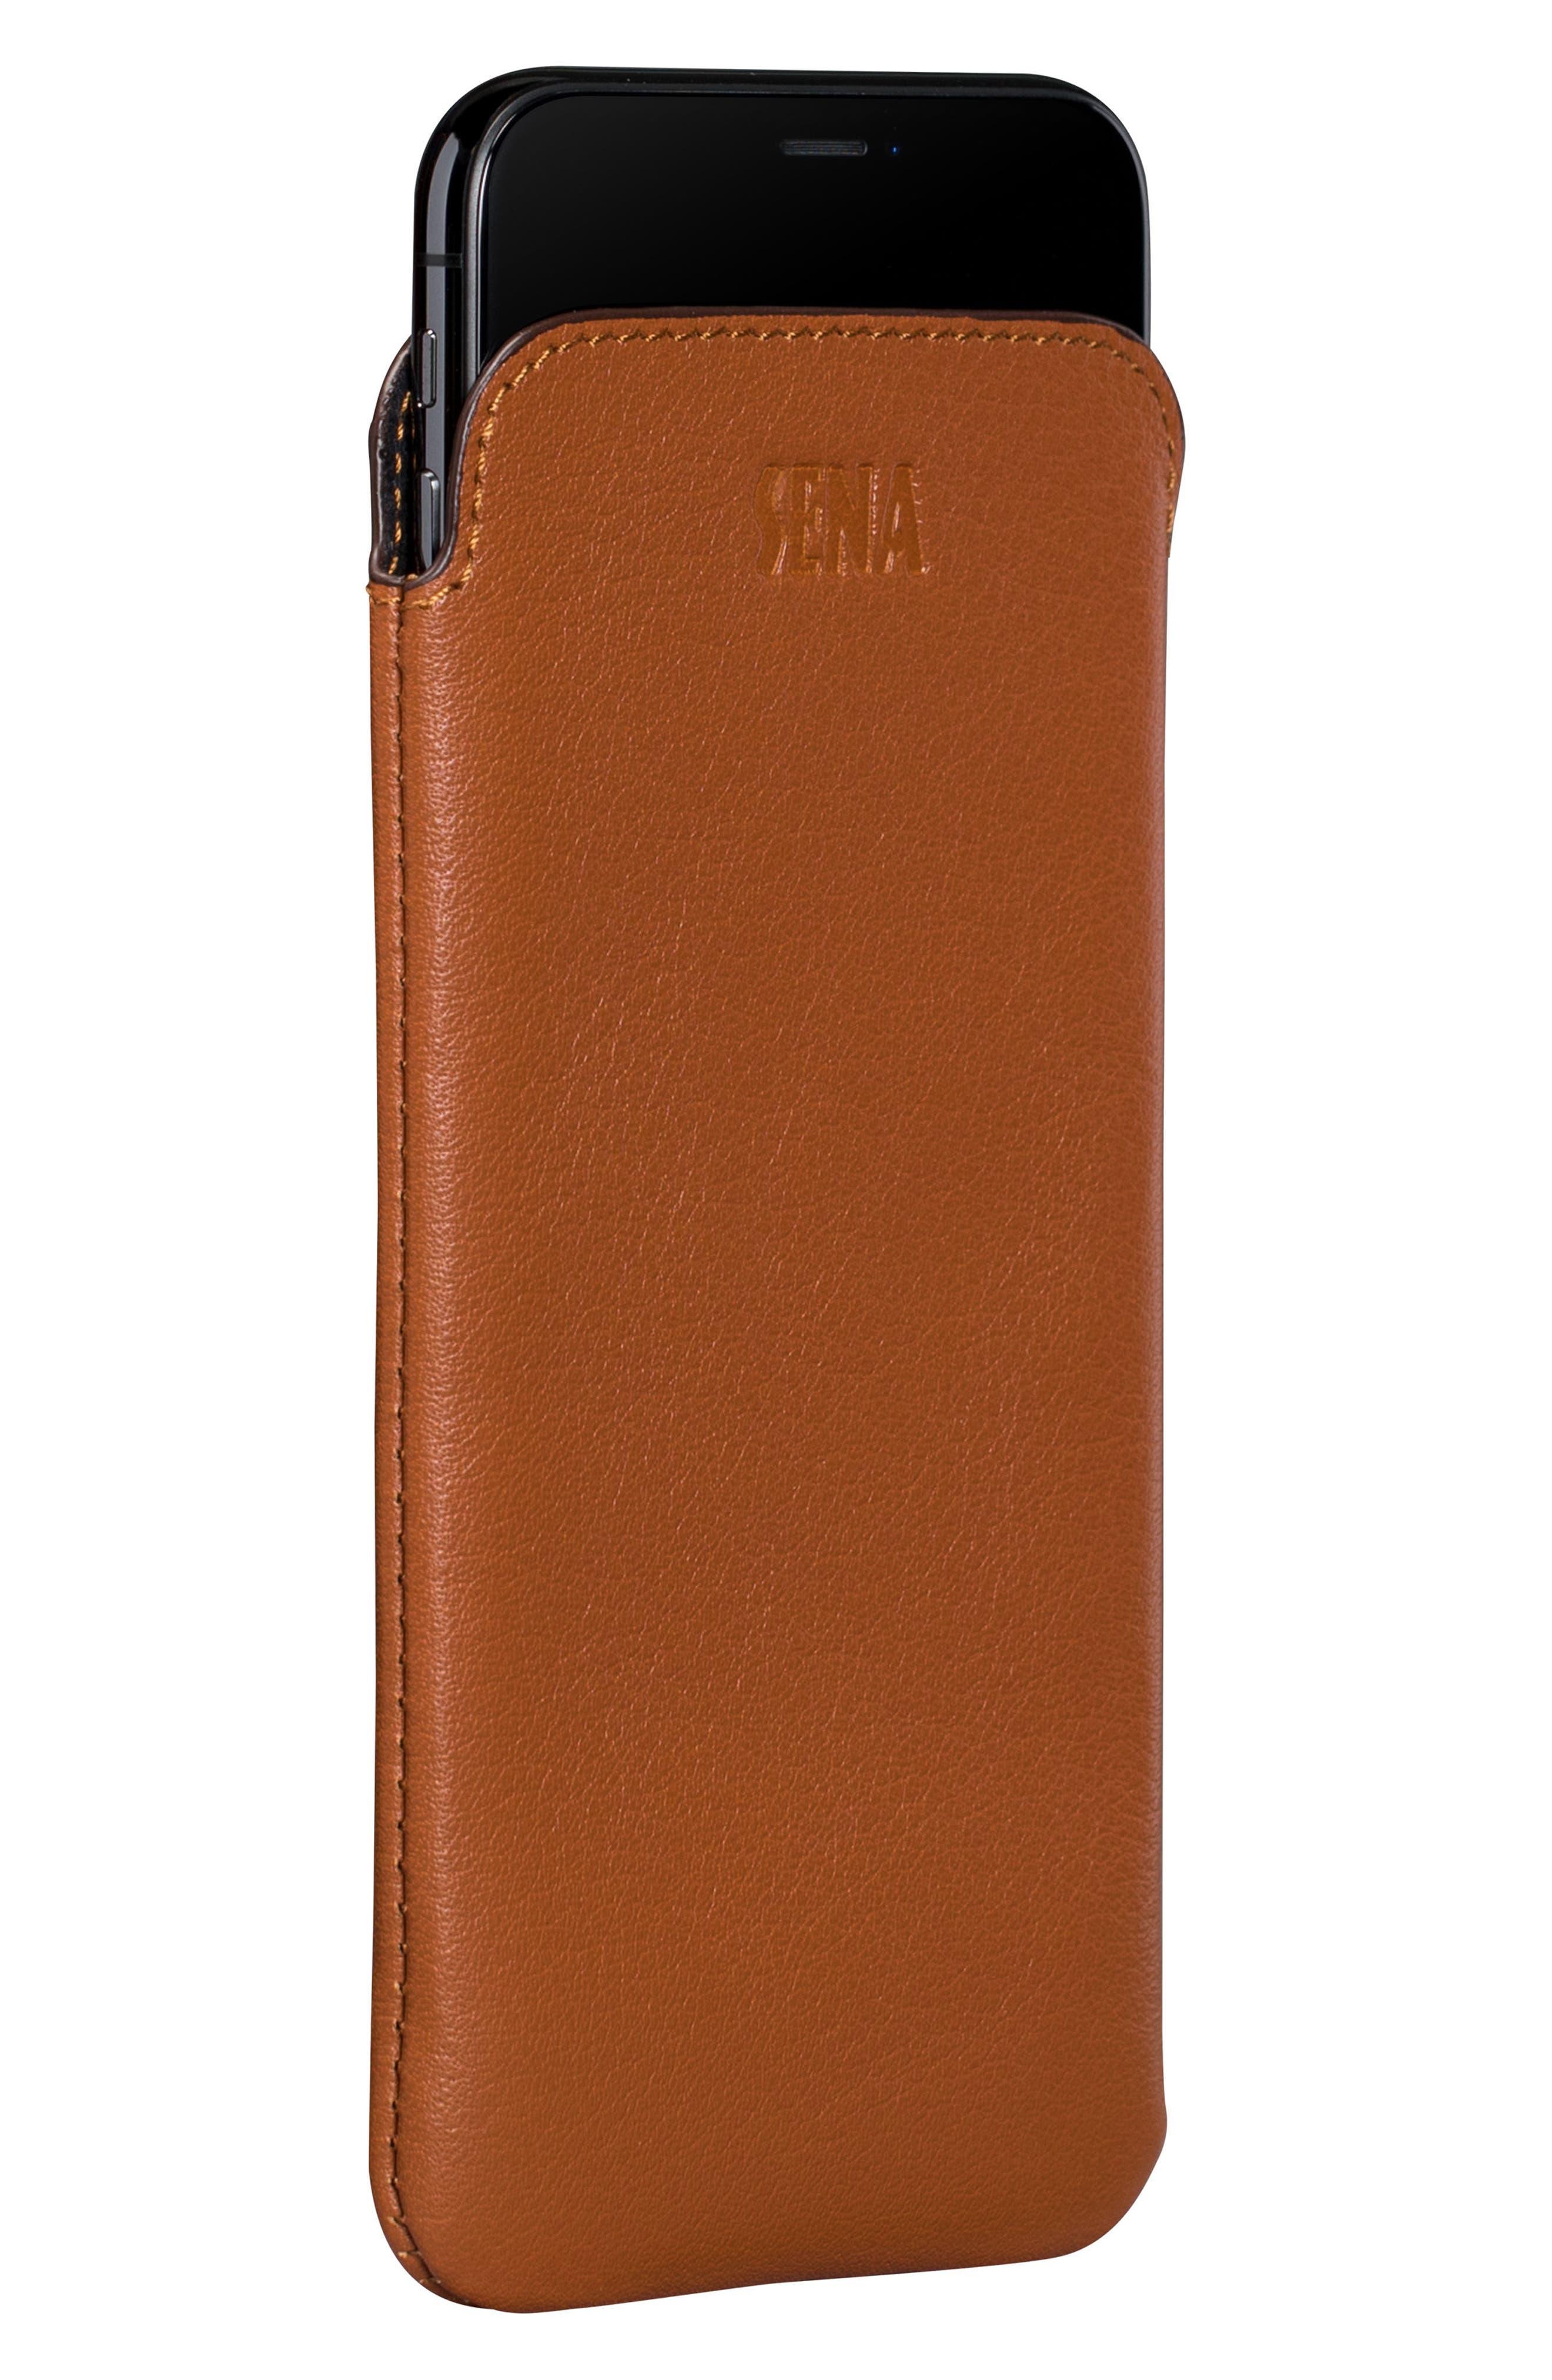 Ultraslim iPhone 6/7/8 Leather Sleeve,                             Alternate thumbnail 2, color,                             Tan